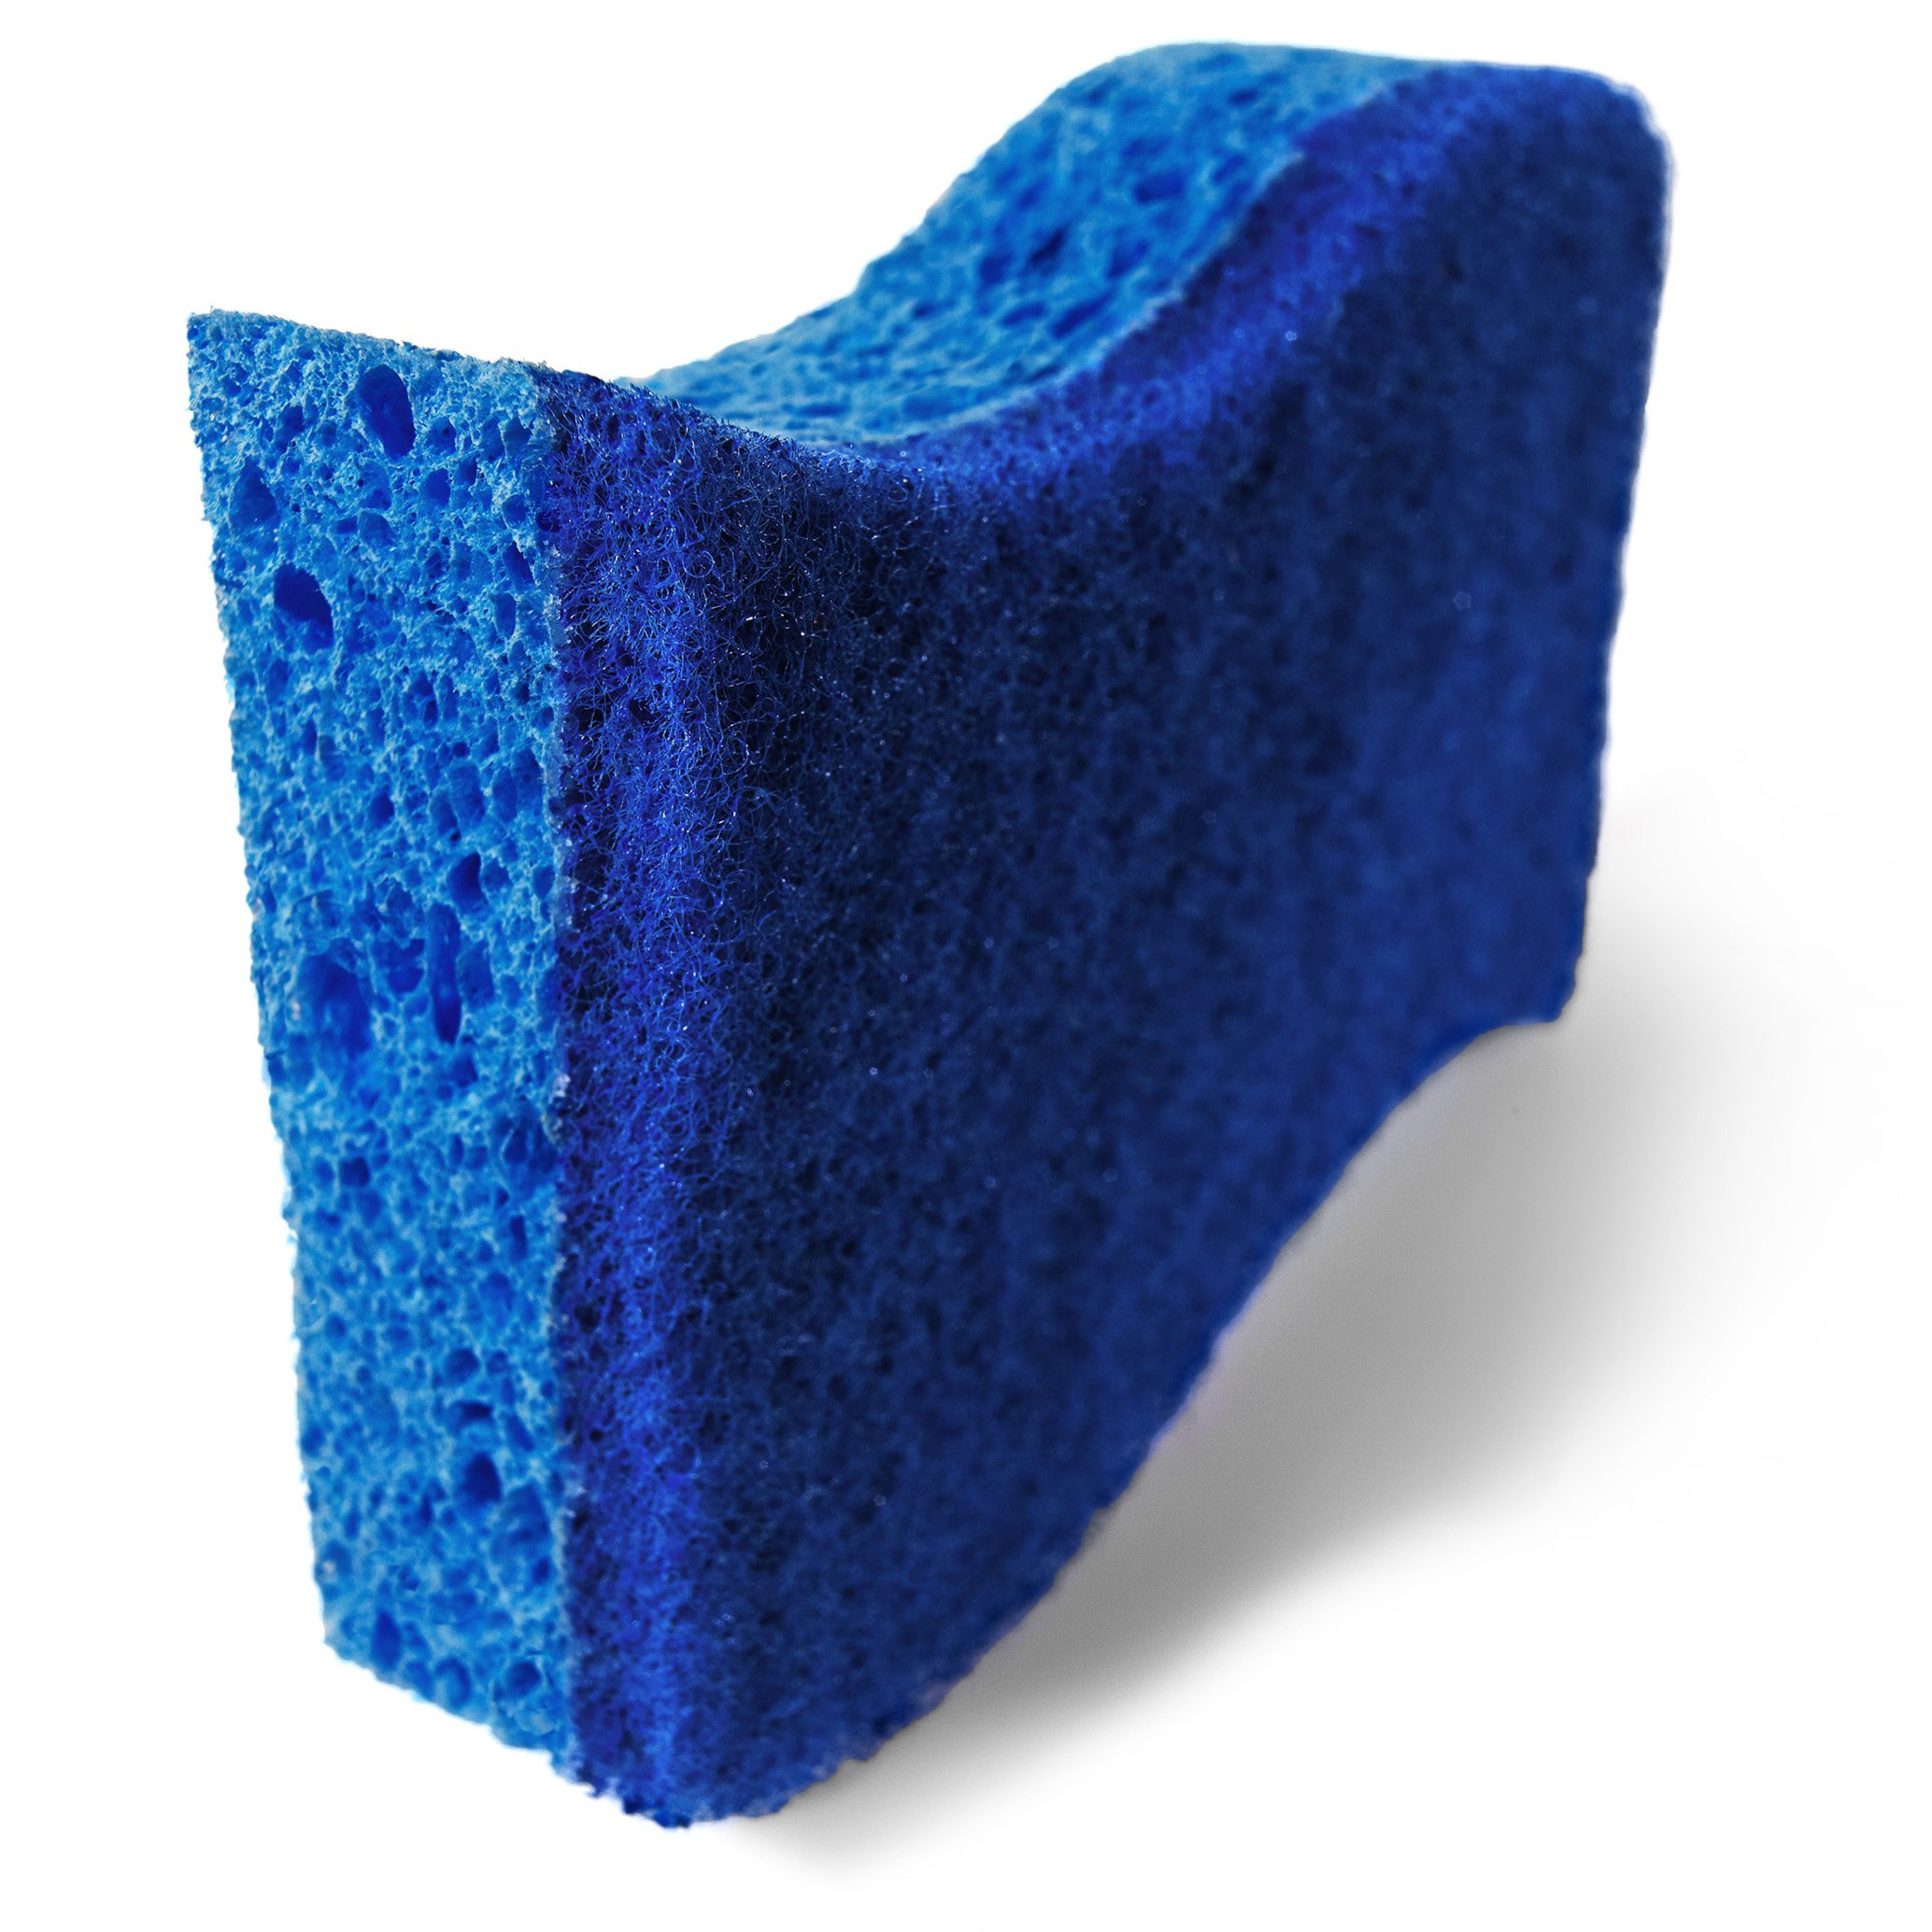 Scotch-Brite Non-Scratch Sponges, 48 Count, Built Strong to Last Long by Scotch-Brite (Image #3)